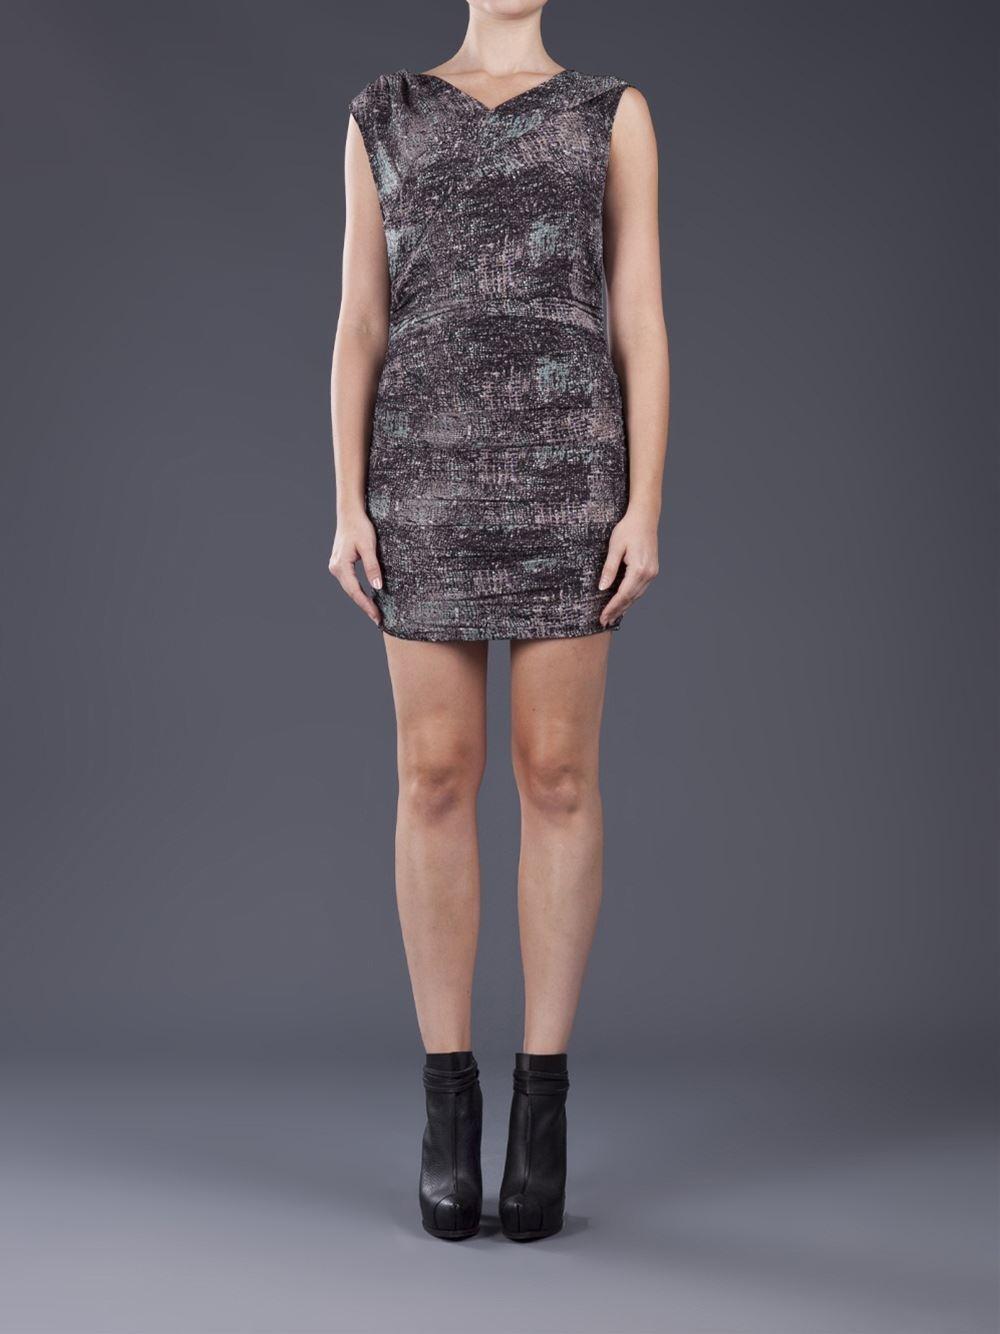 IRO Heidi Printed Printed Printed Multicolor Crepe Dress  425  size 0 d6efcb